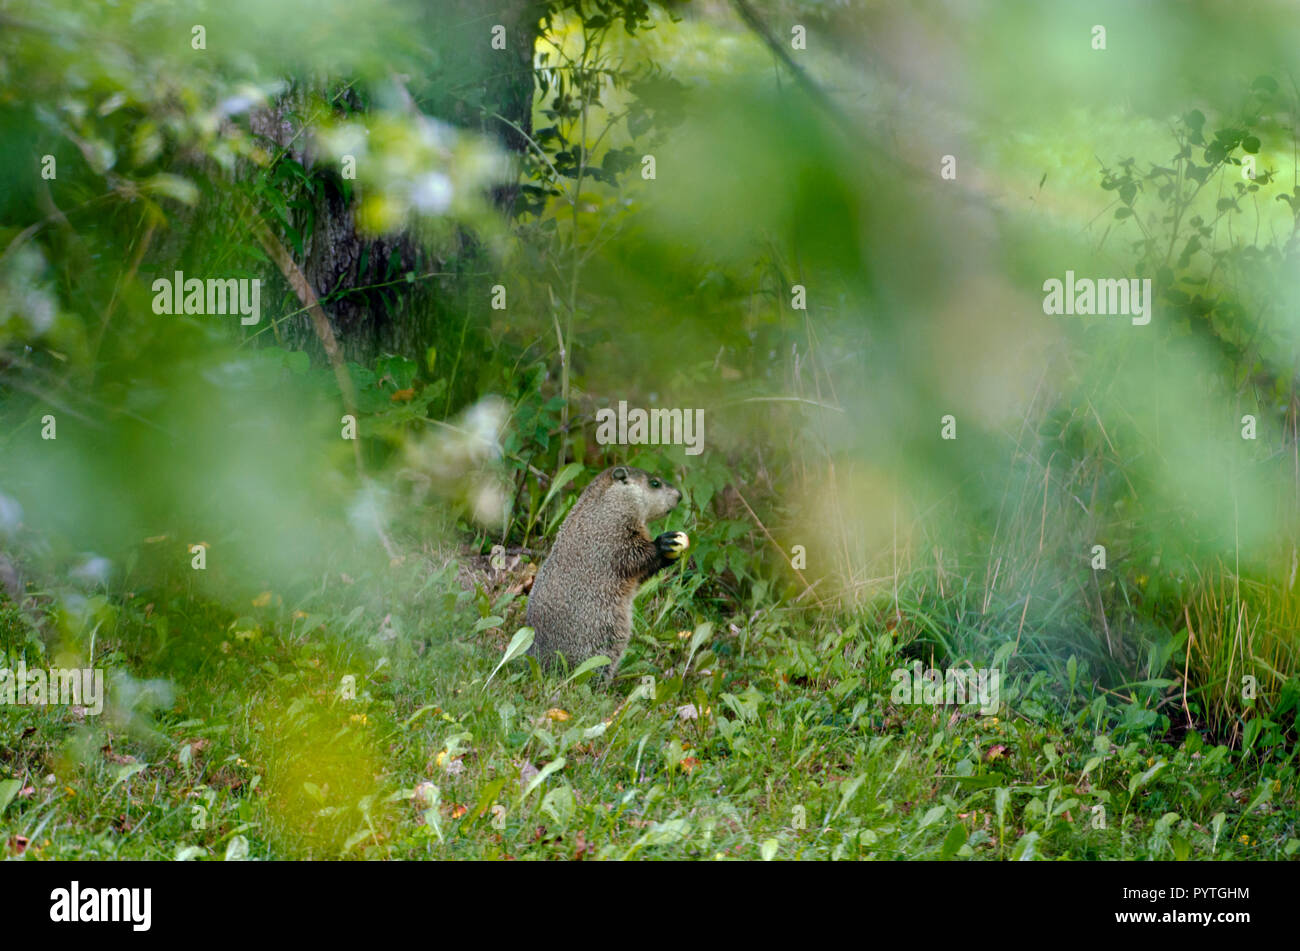 Groundhog or woodchuck eating an apple - Stock Image